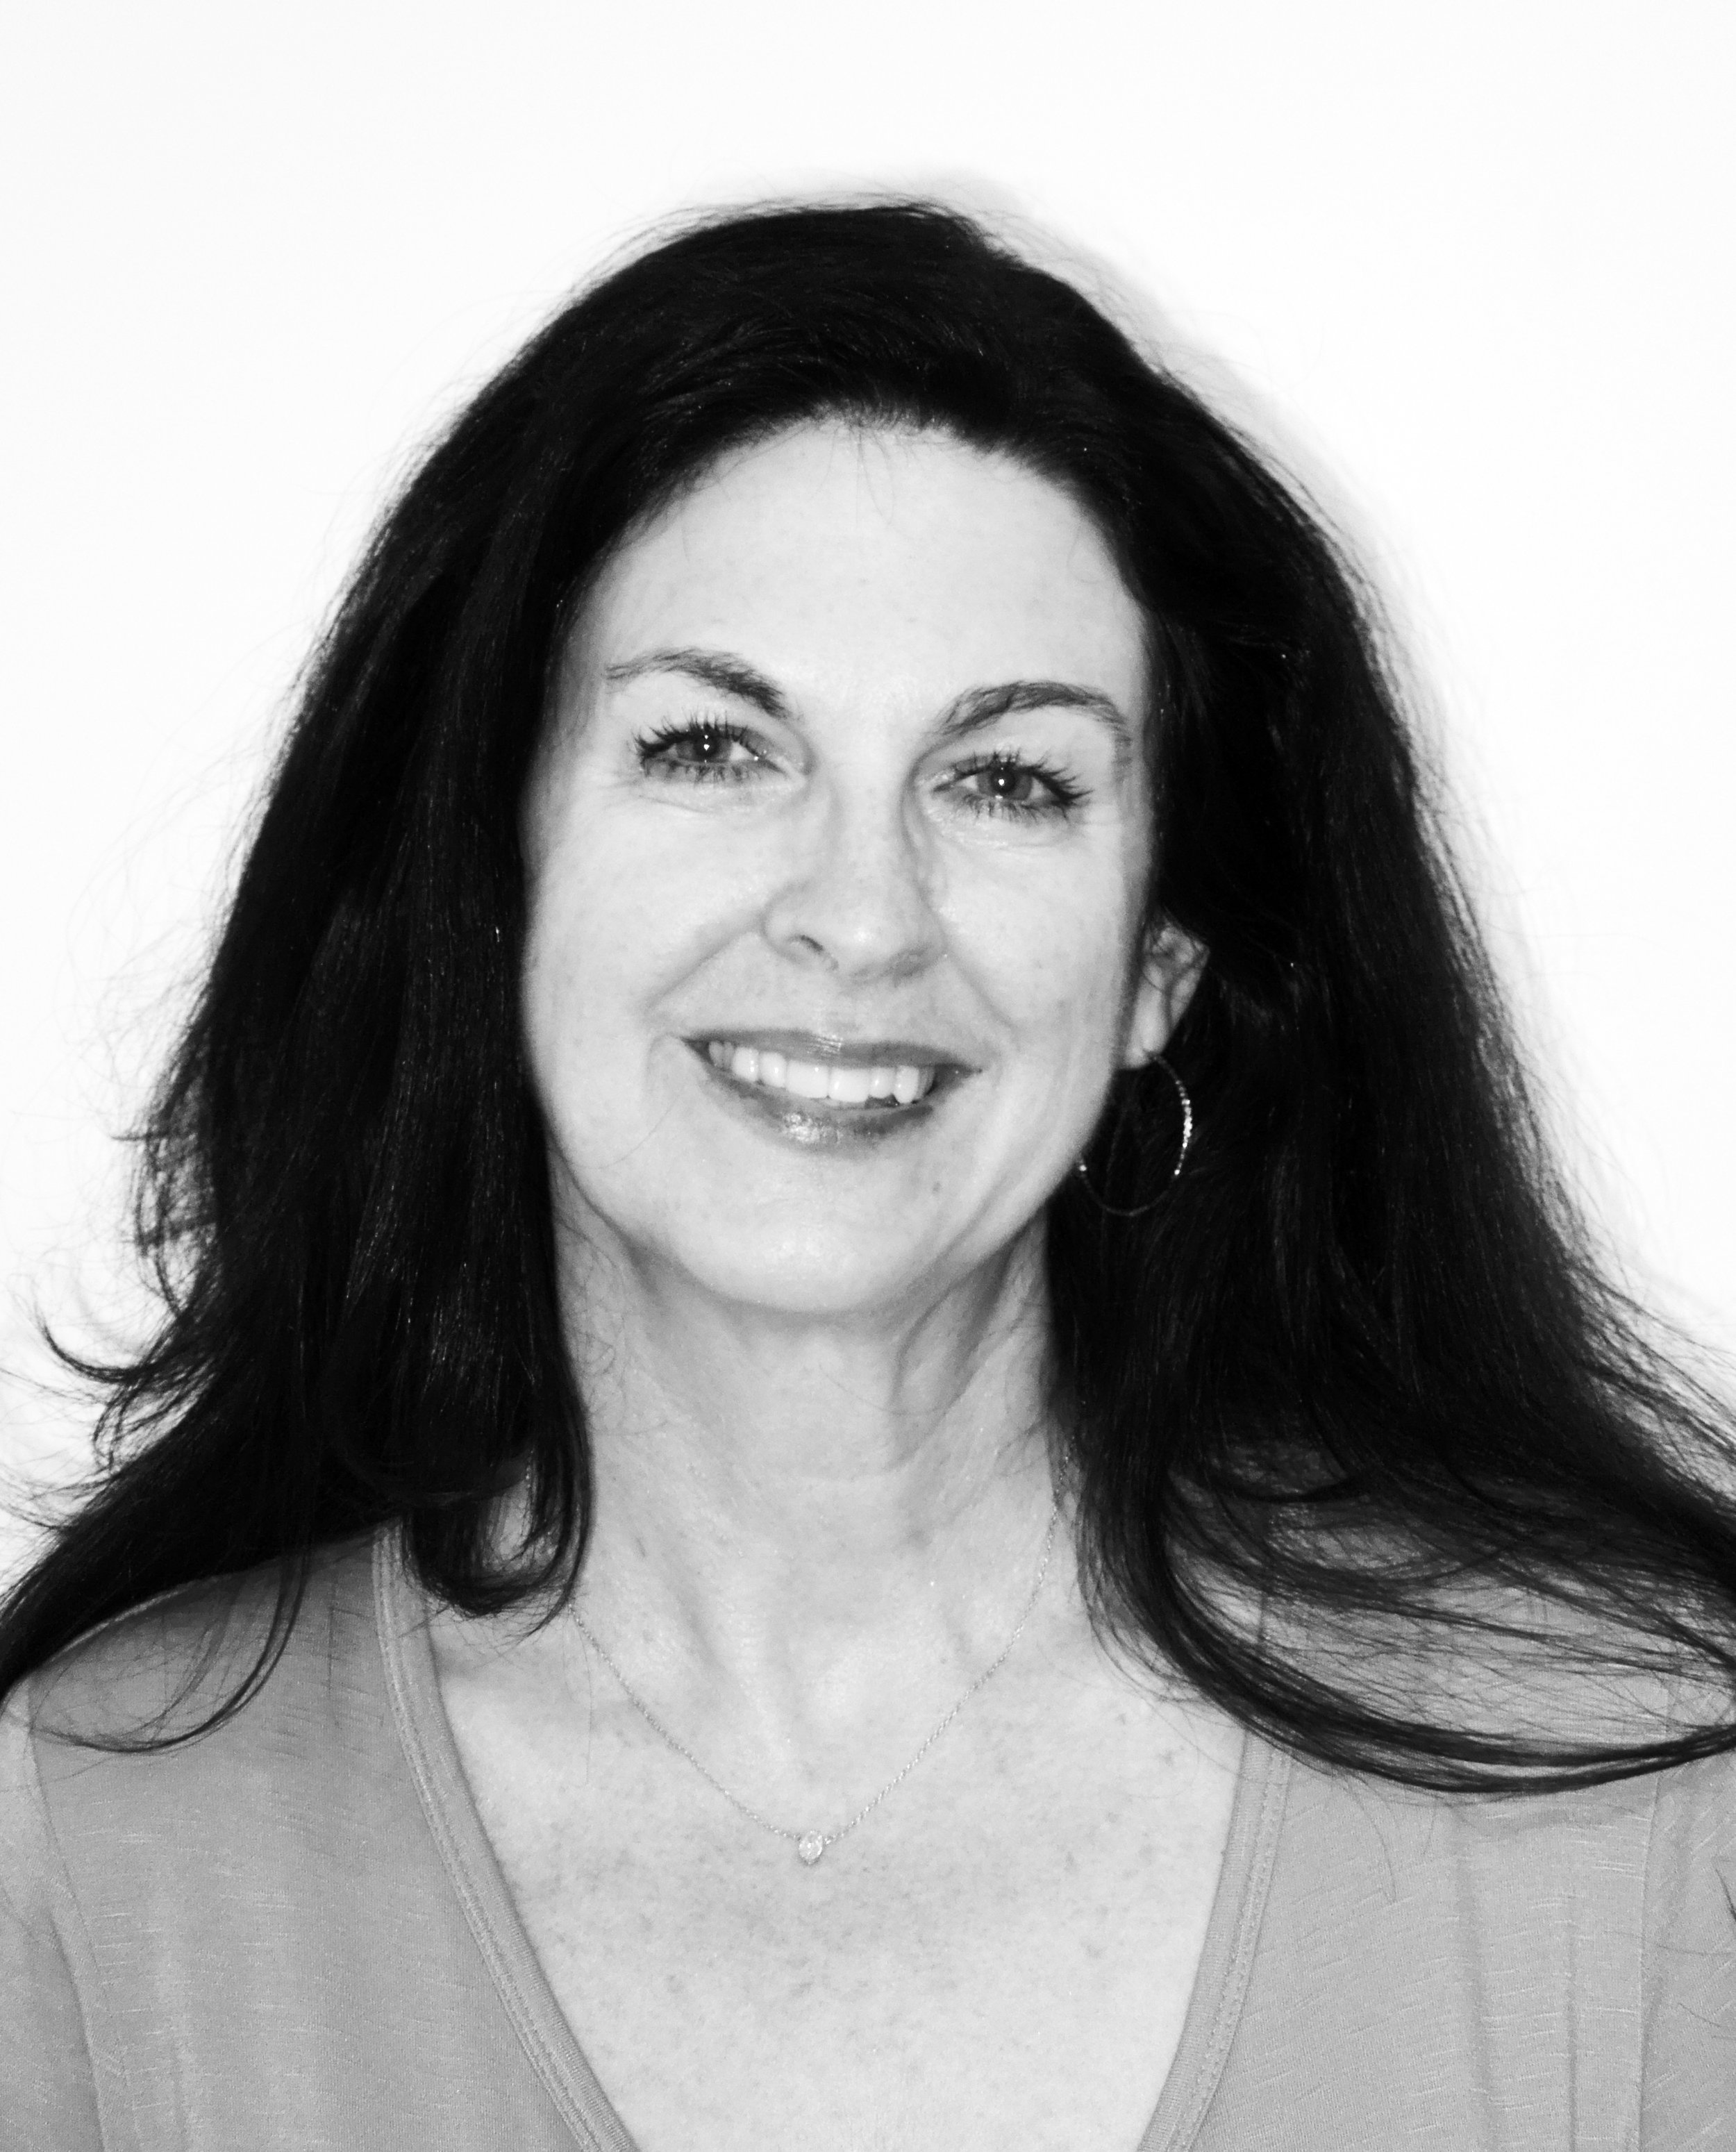 Deborah Kapoor - Head Shot.jpg